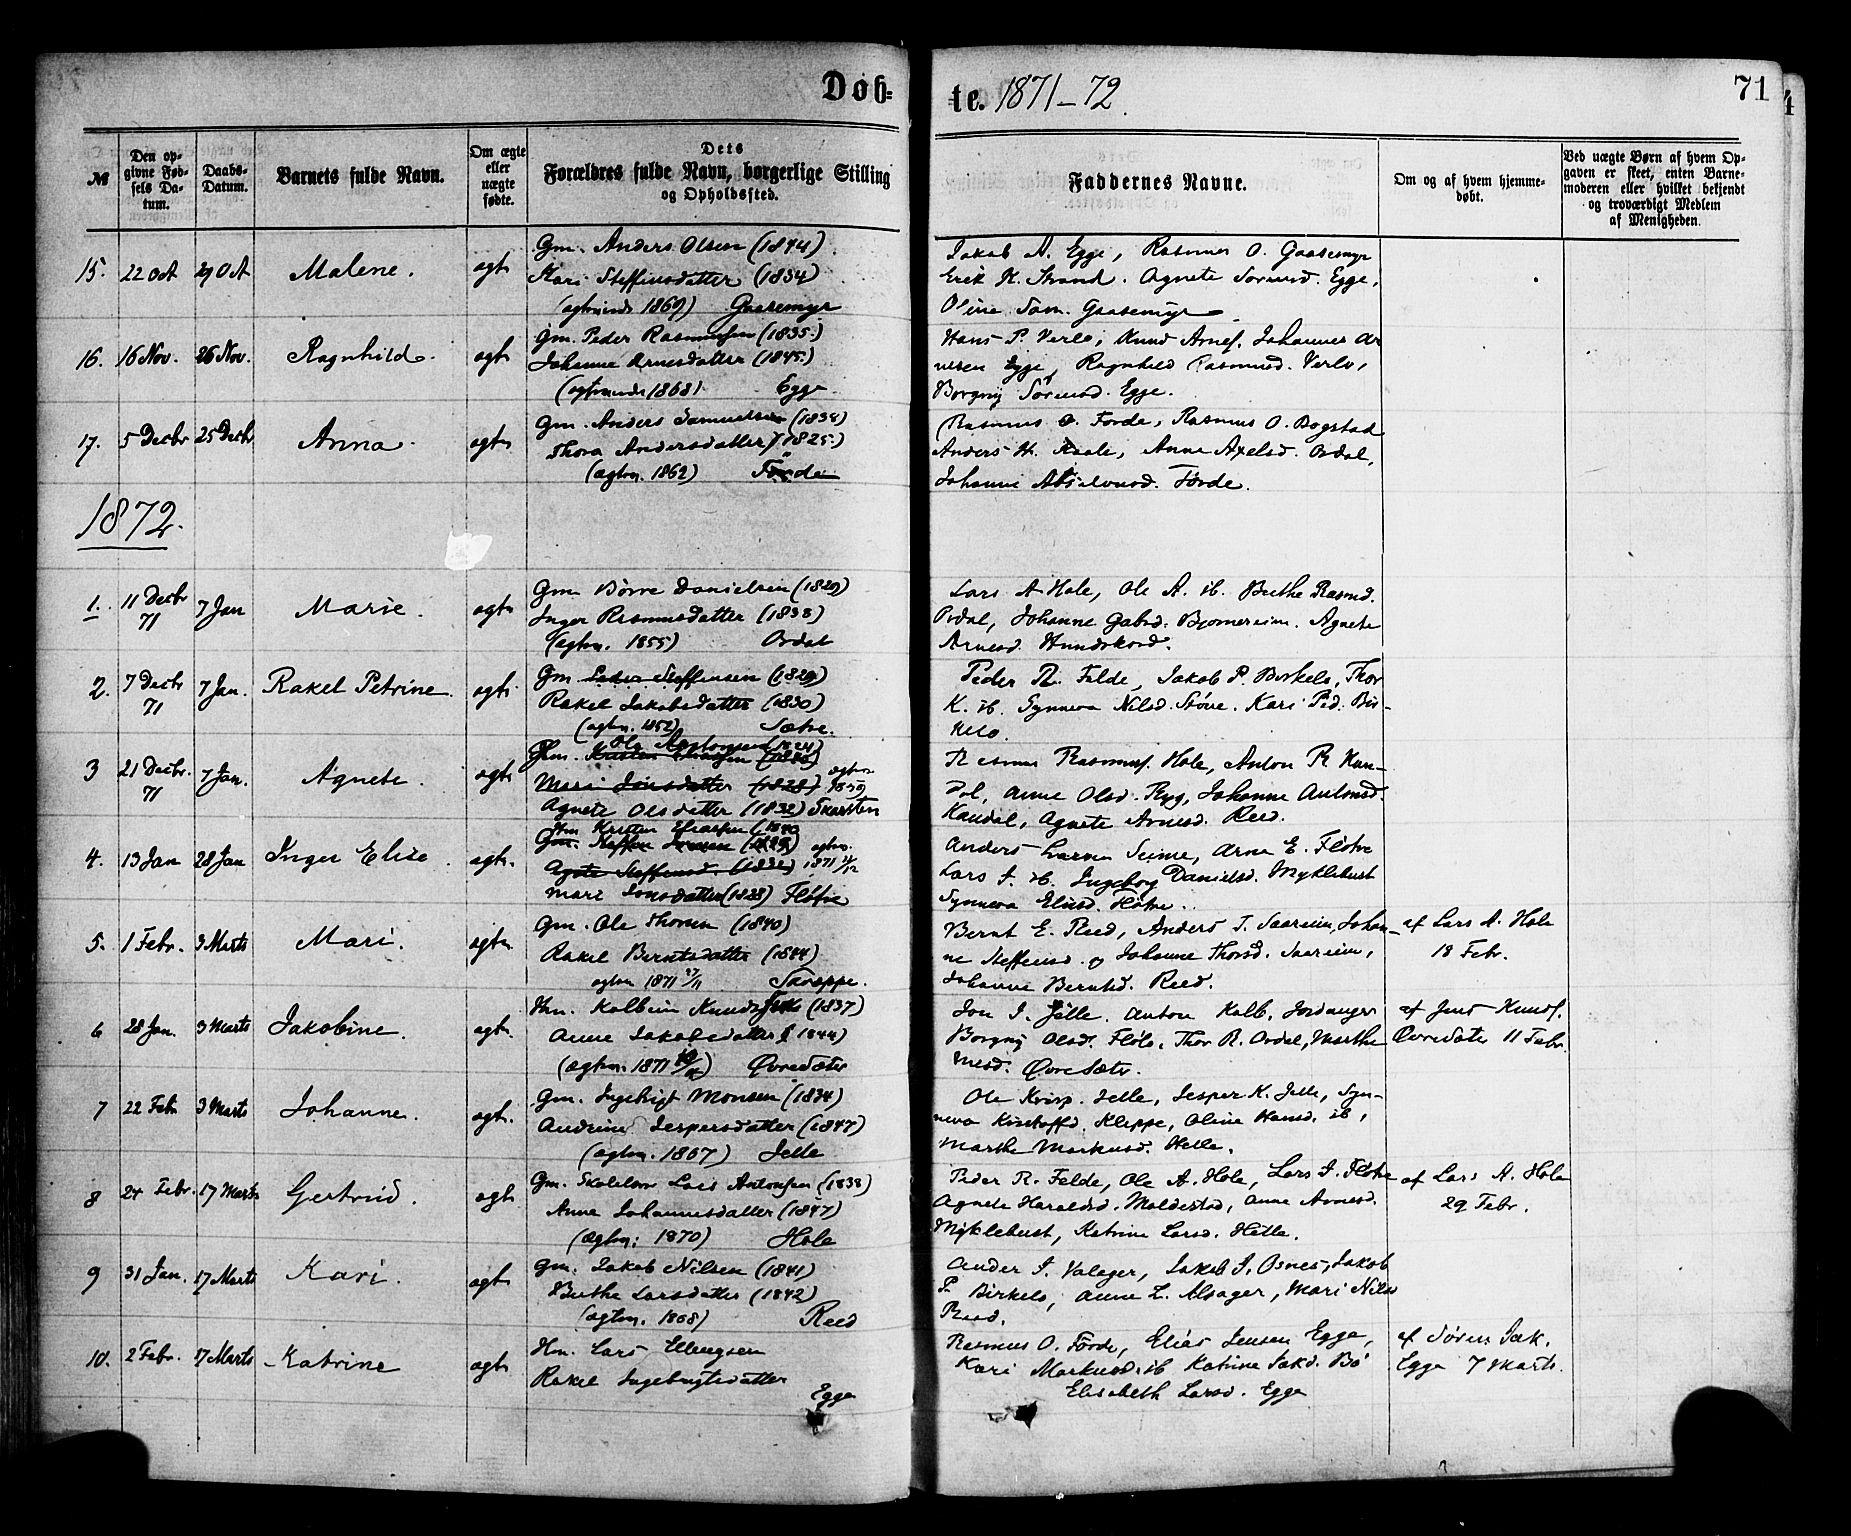 SAB, Gloppen sokneprestembete, H/Haa/Haac/L0001: Ministerialbok nr. C 1, 1871-1886, s. 71